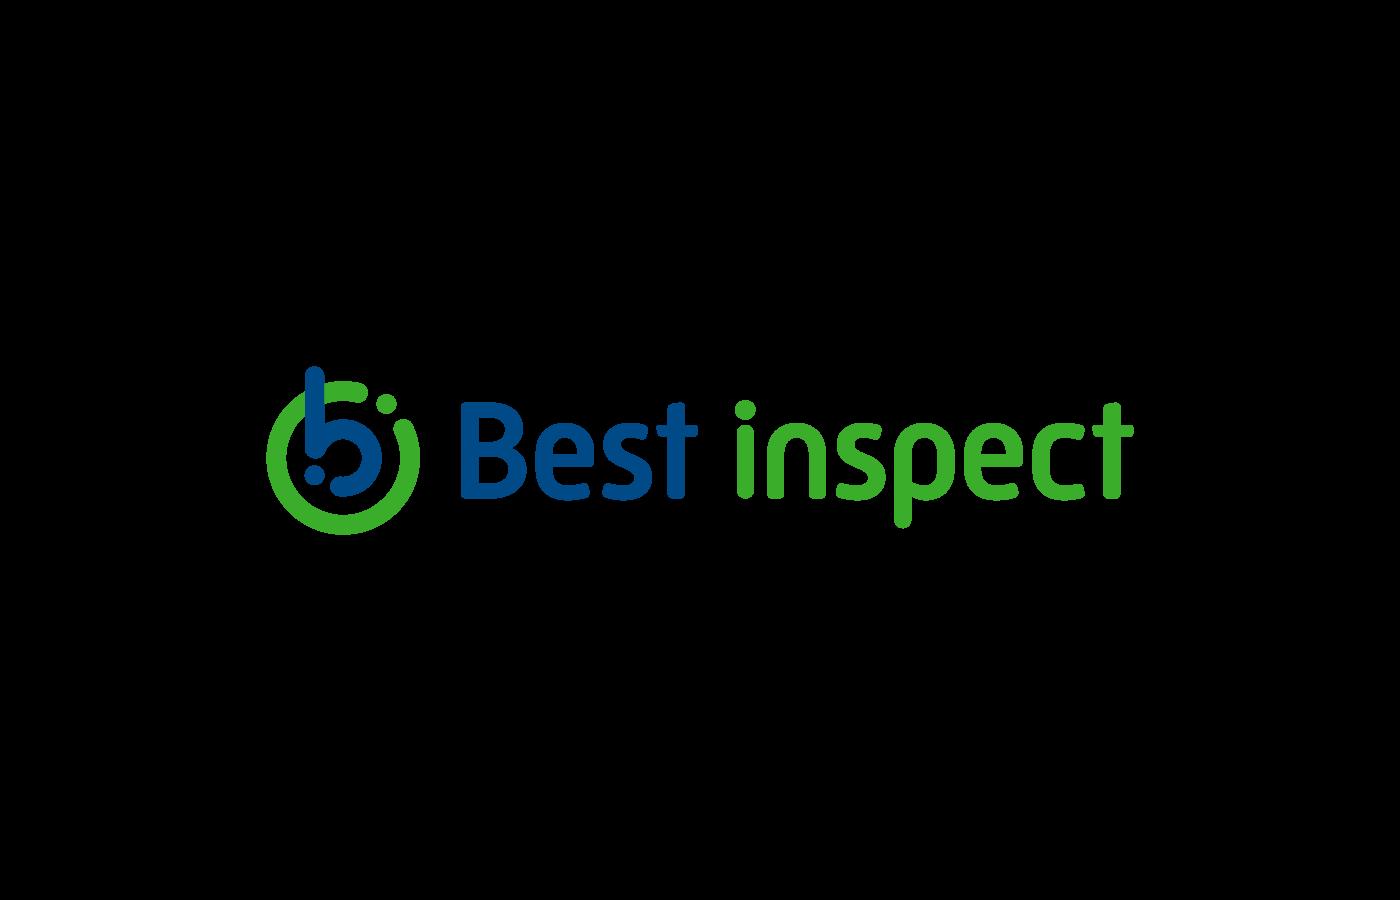 Best inspect logo